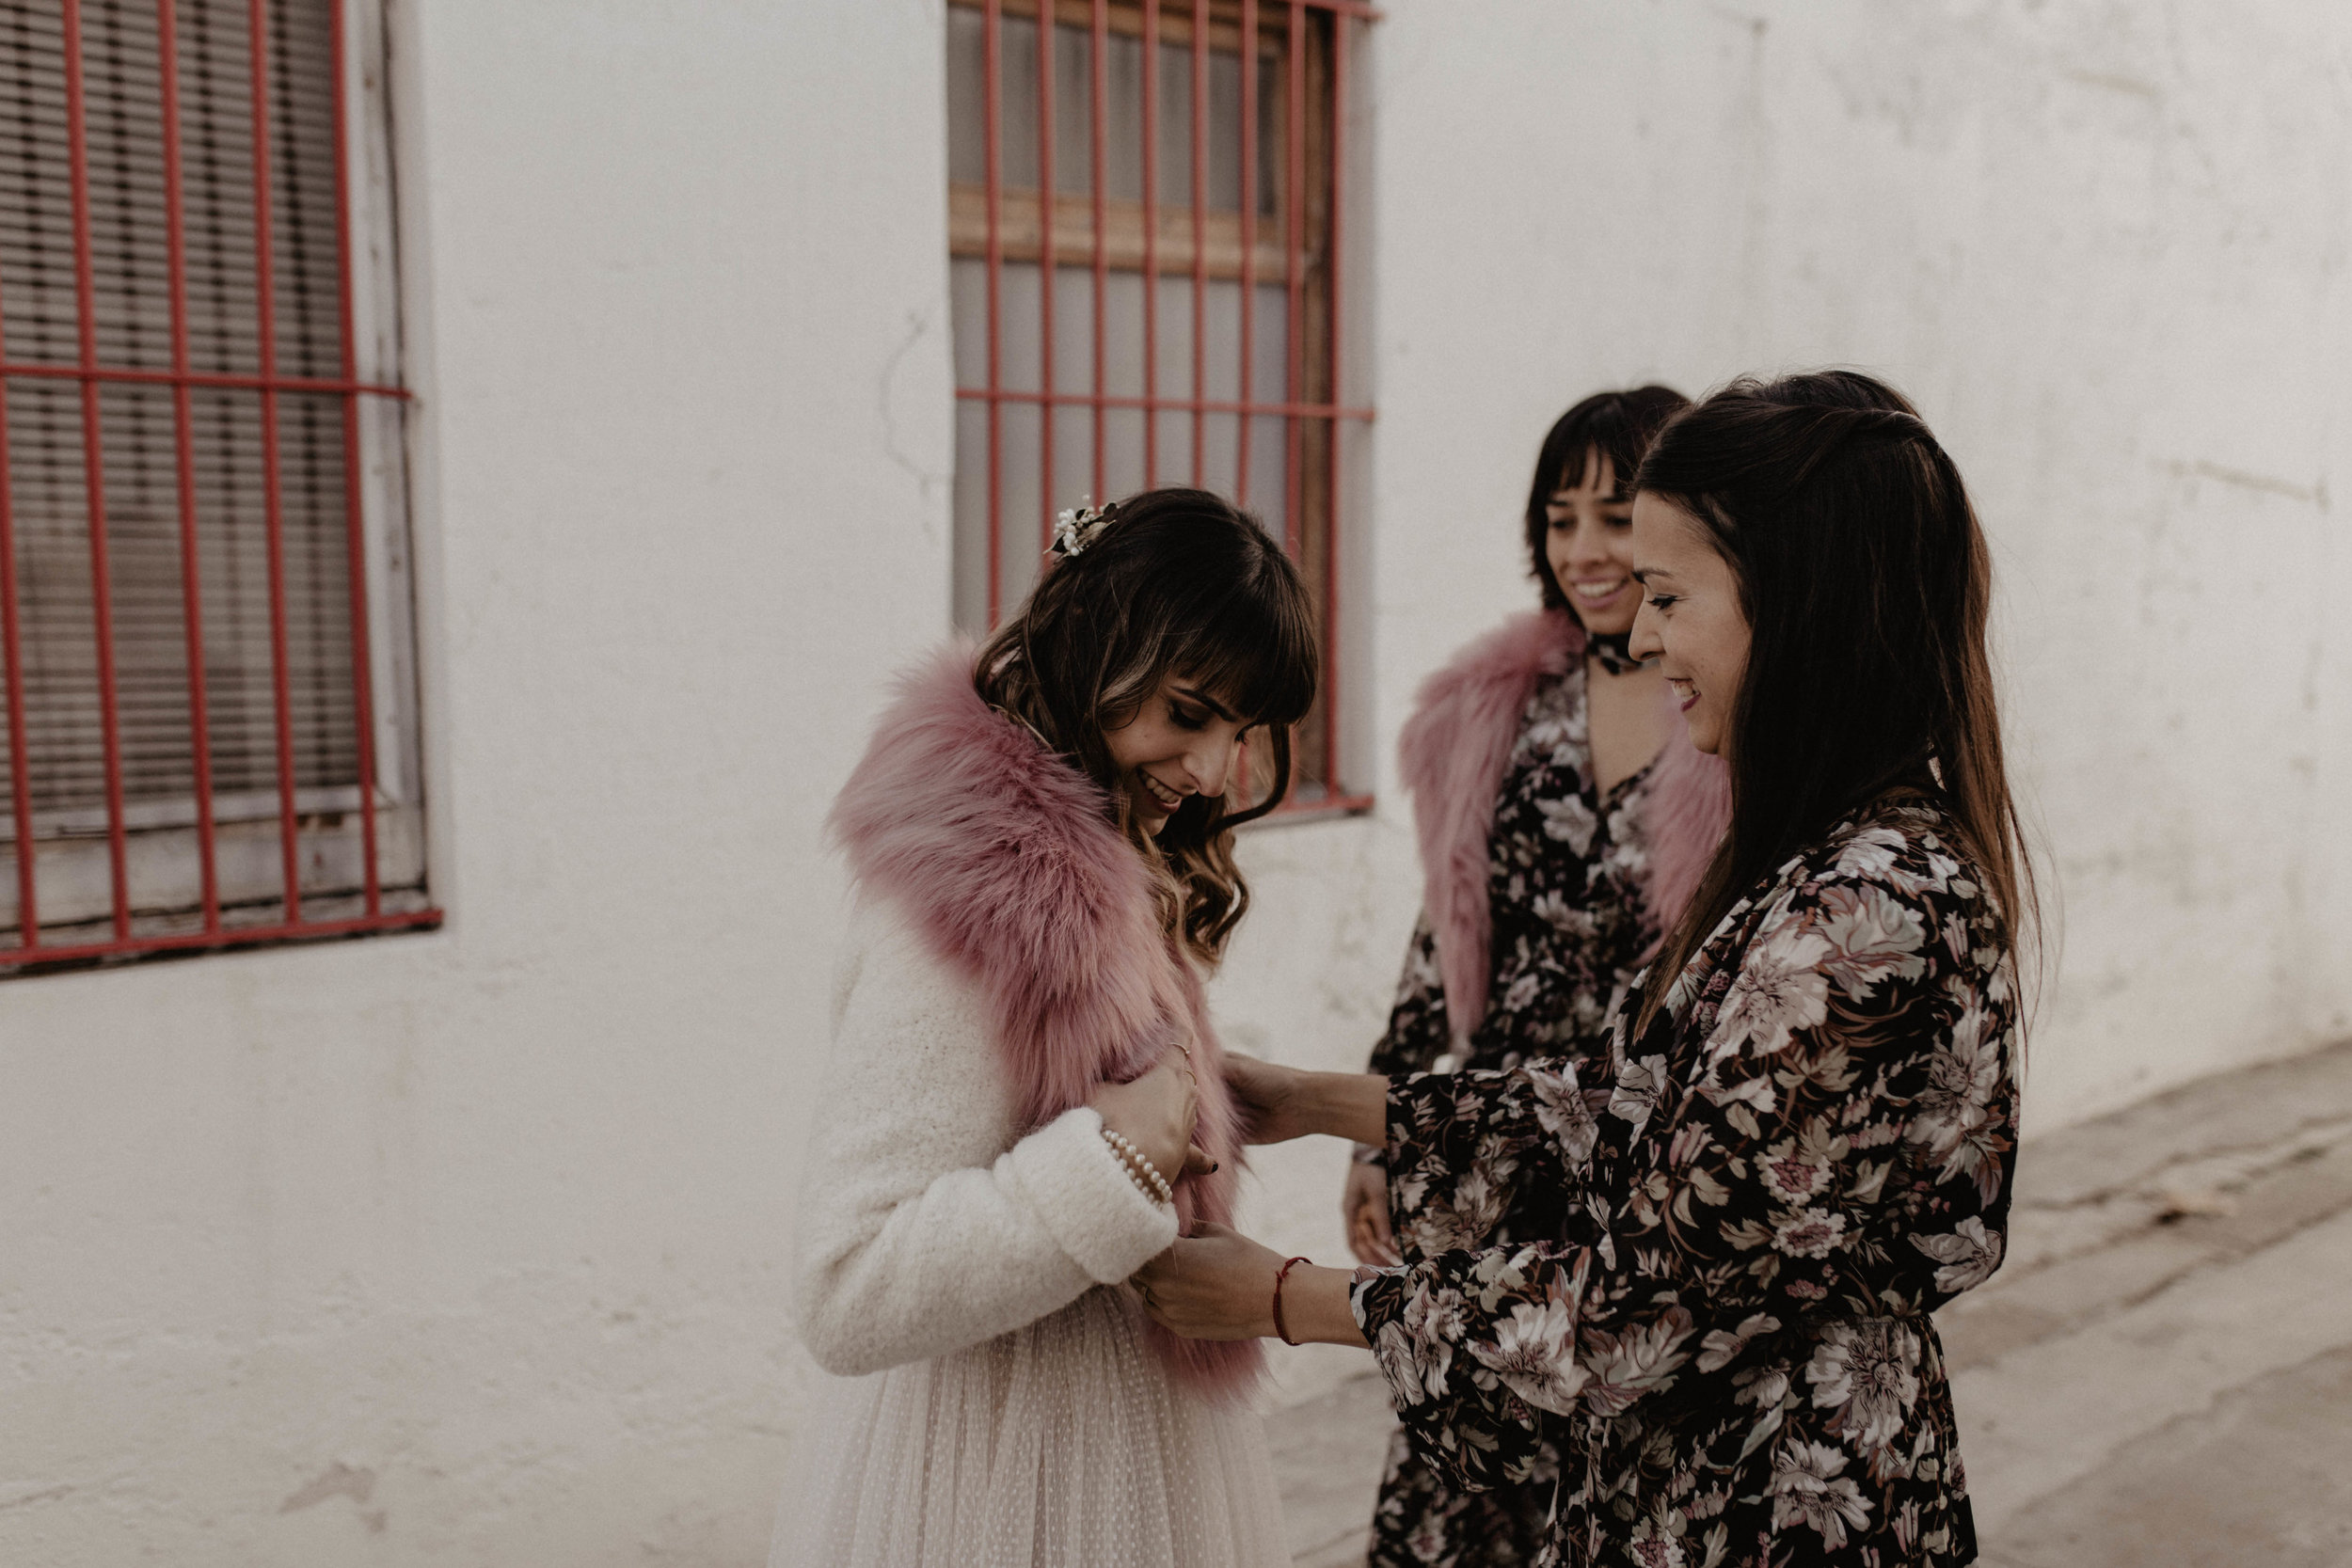 thenortherngirlphotography-photography-weddingphotography-couple-bodasconestilo-bodasenbarcelona-martadavid-218.jpg